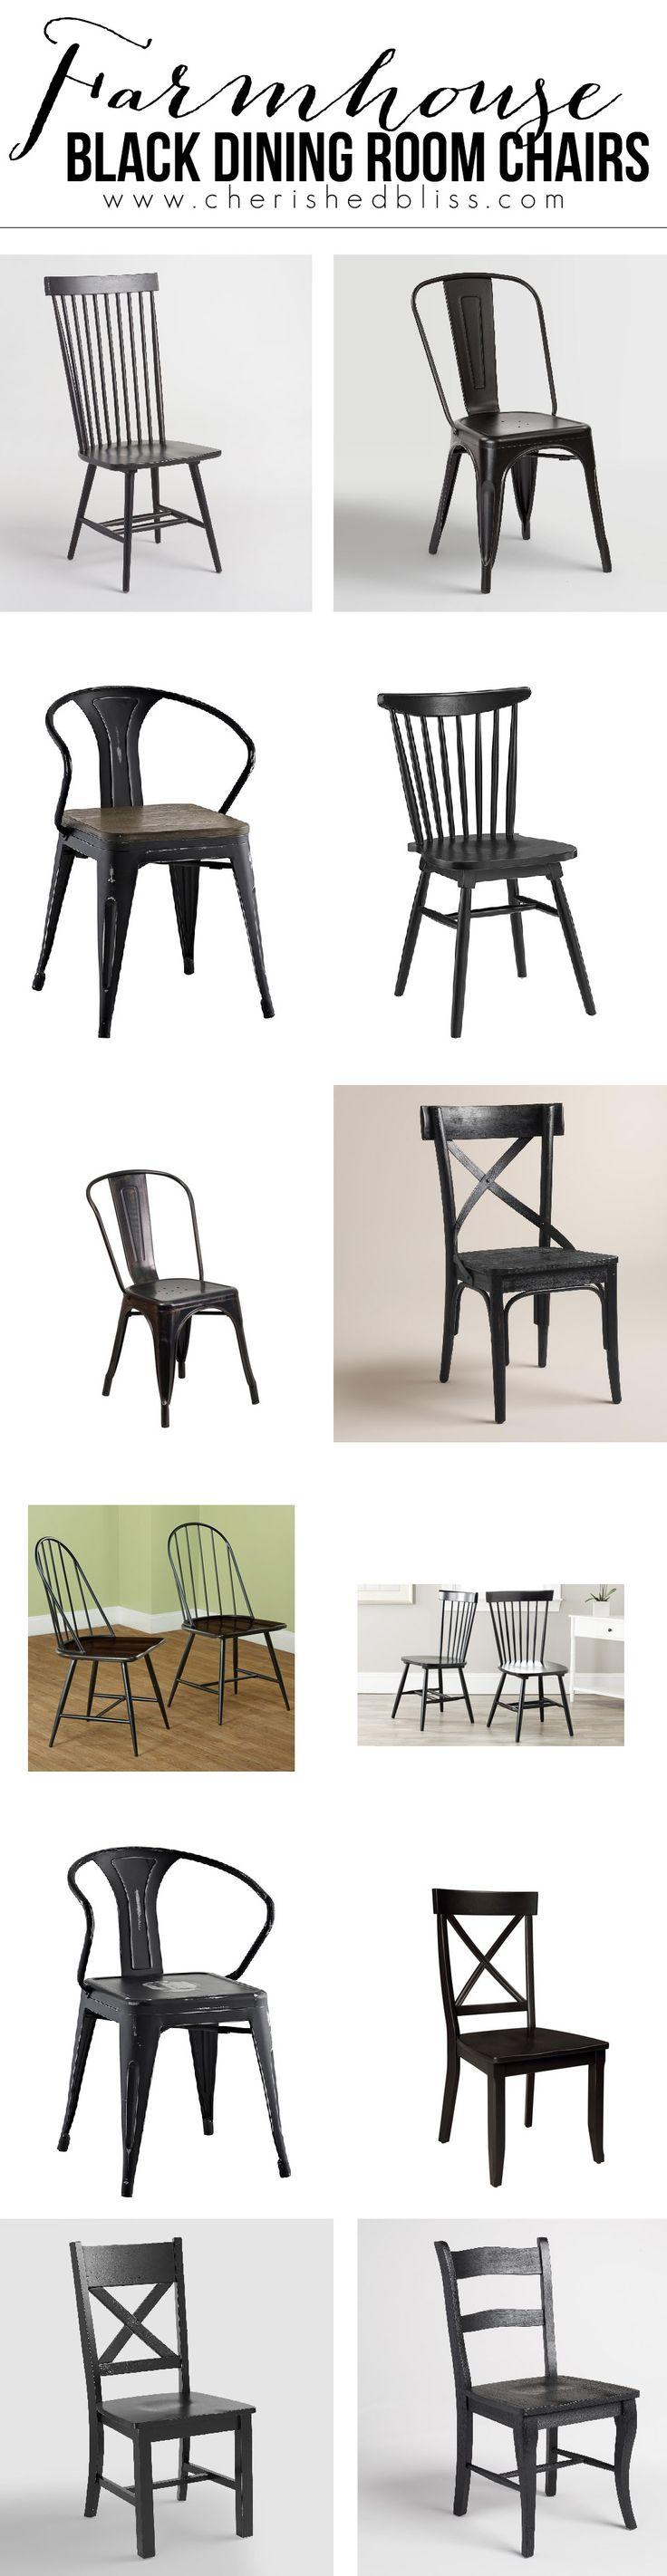 Farmhouse Black Dining Room Chairs